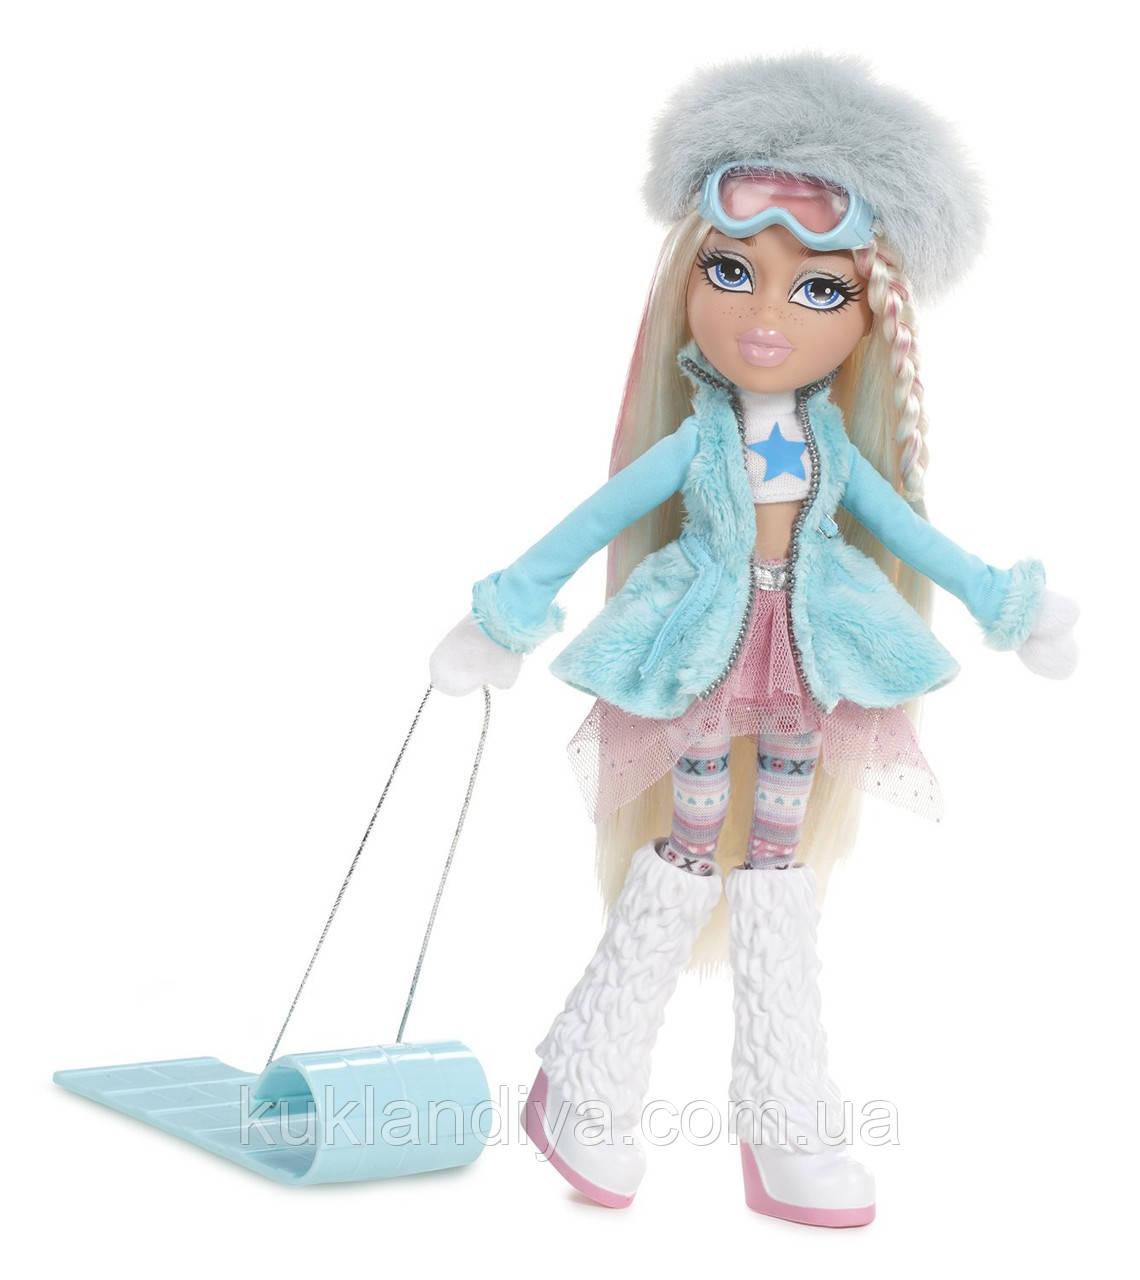 Кукла Братц Хлоя Снежный поцелуй